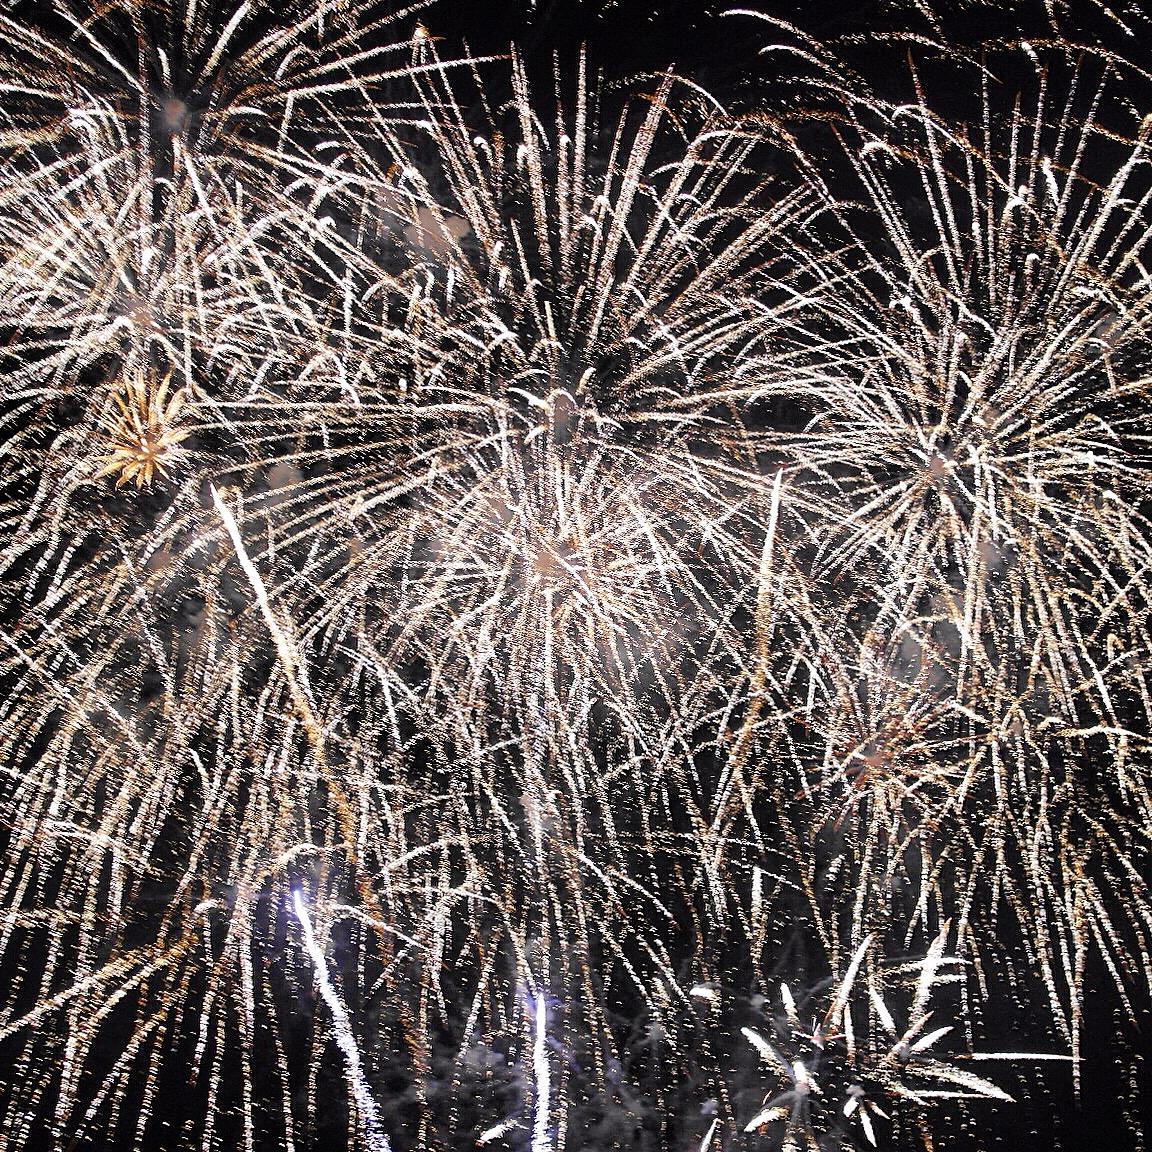 Guy Fawkes Night, Bonfire Night, Fireworks Night, Aberdeen 2014